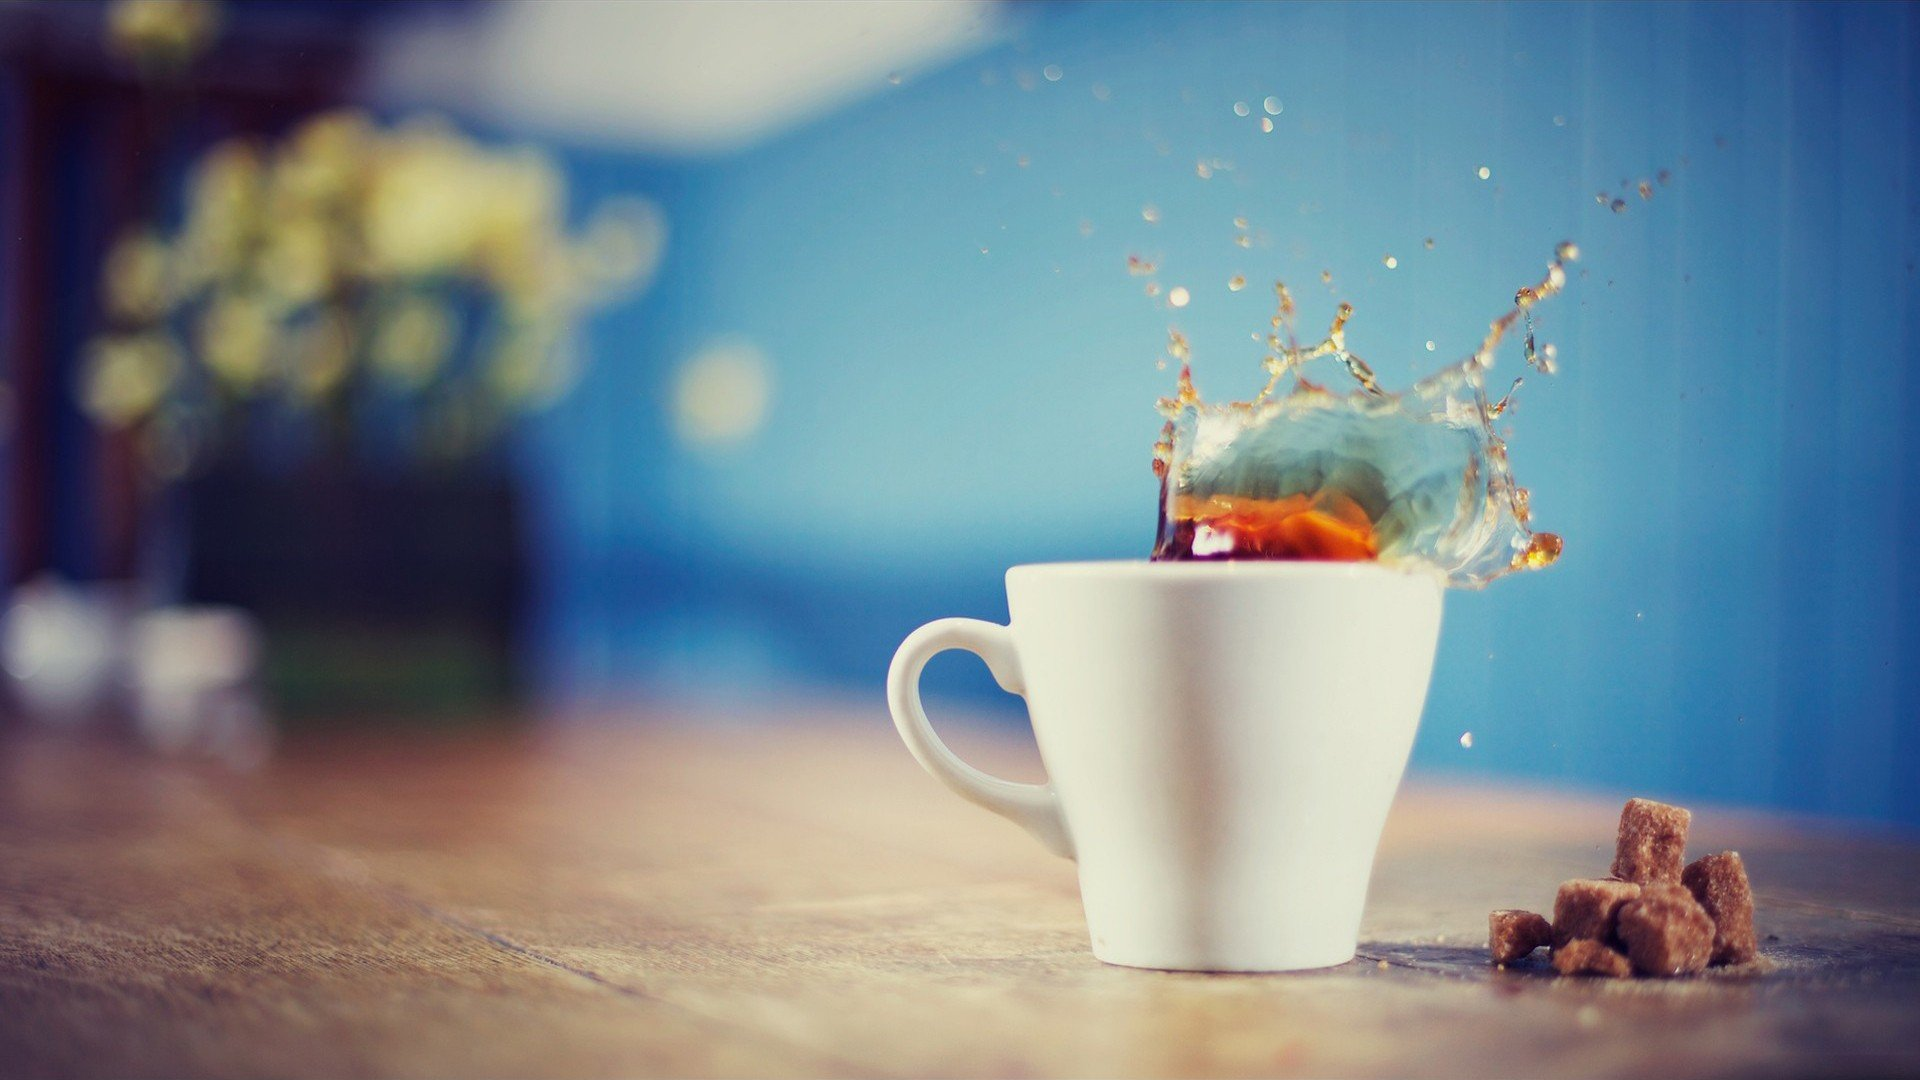 coffee, Cup, Splashes, Sugar, Depth of field Wallpaper